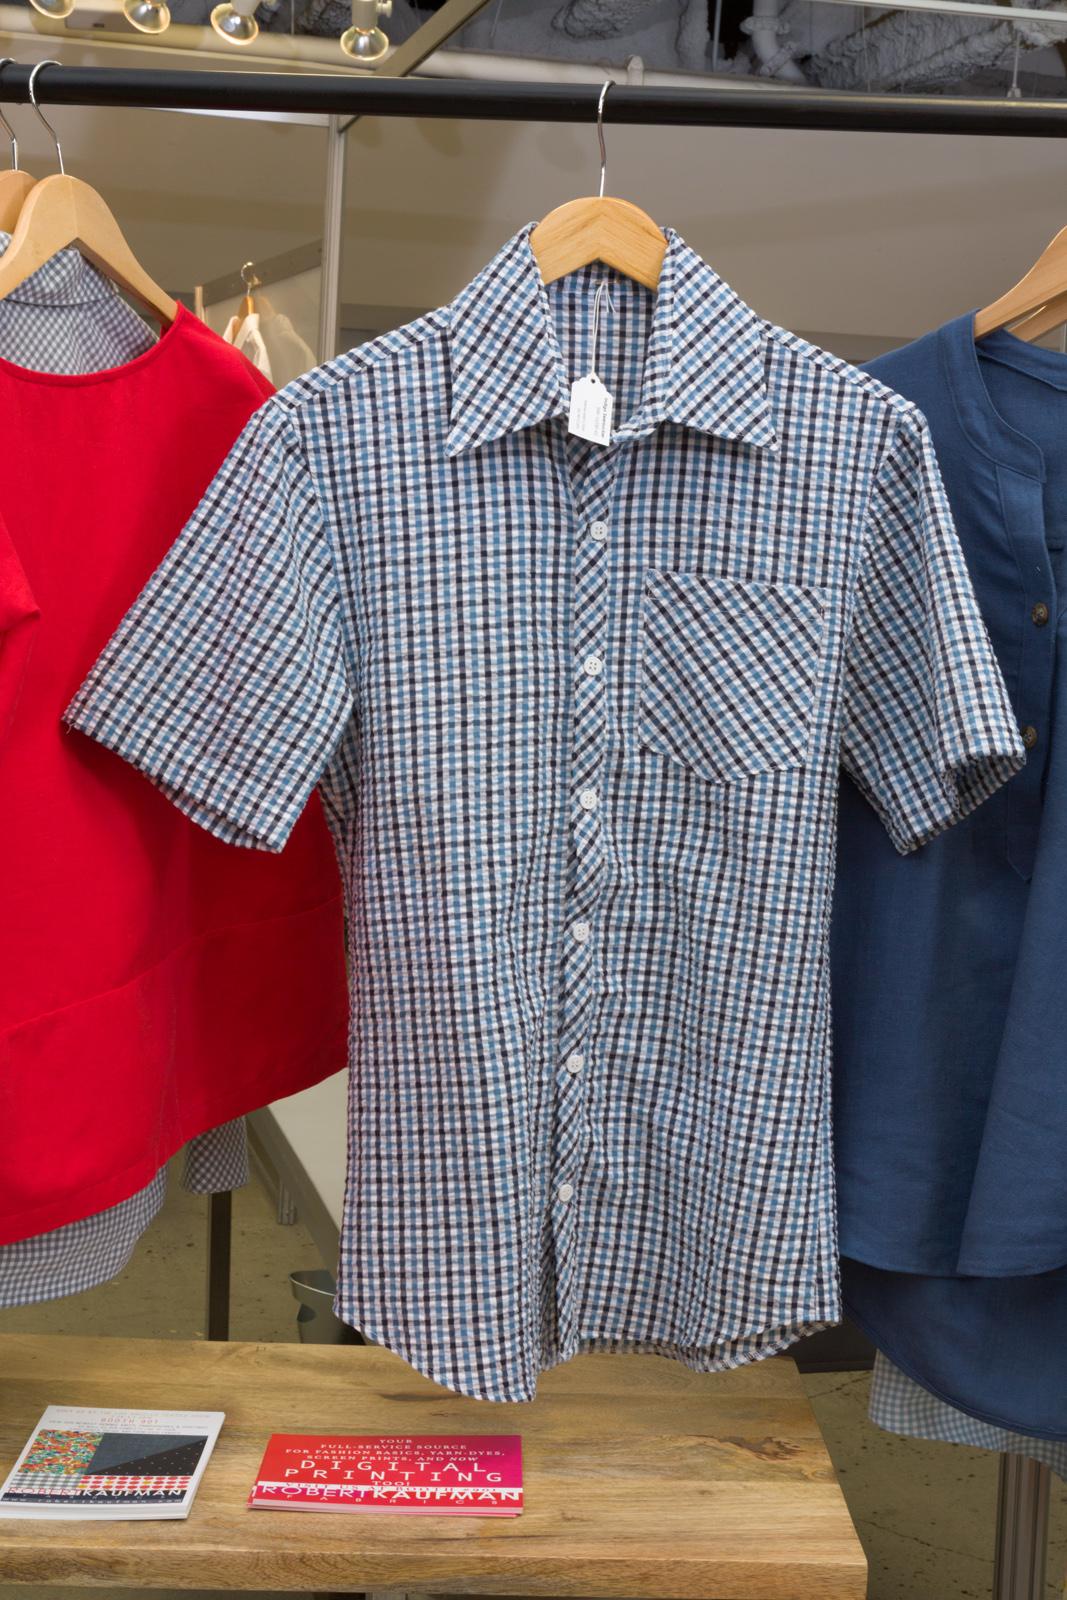 M6044 Men's Shirt   by   McCall's ,  made by   Ramona Rose  , featuring   Indigo Seersucker.